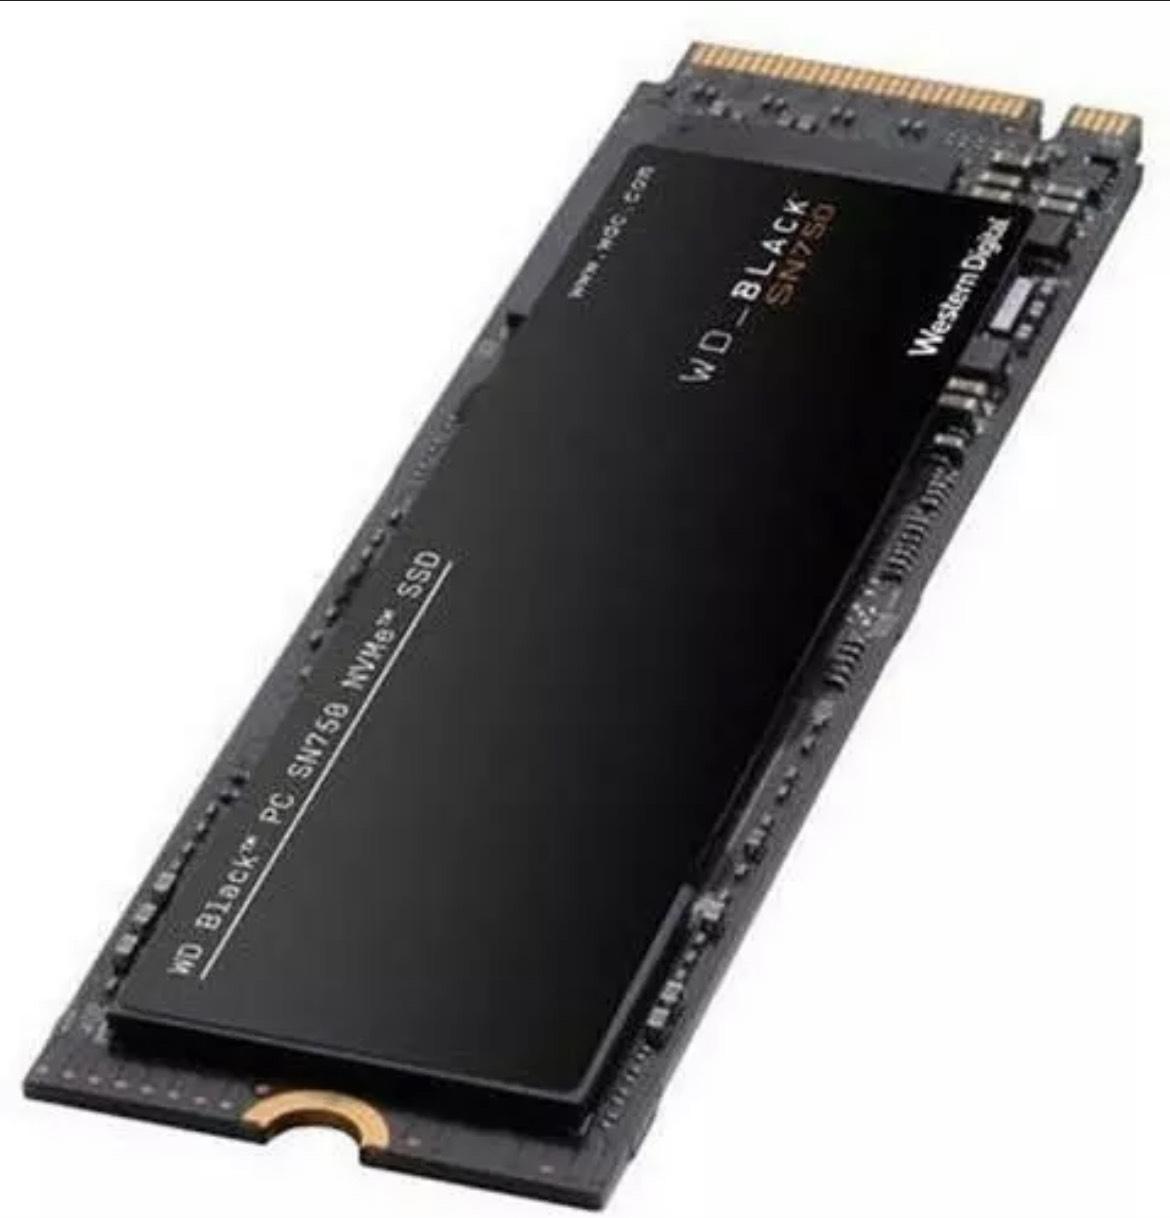 WD Black SN750 M.2 SSD 500GB £59.99 @ box / eBay